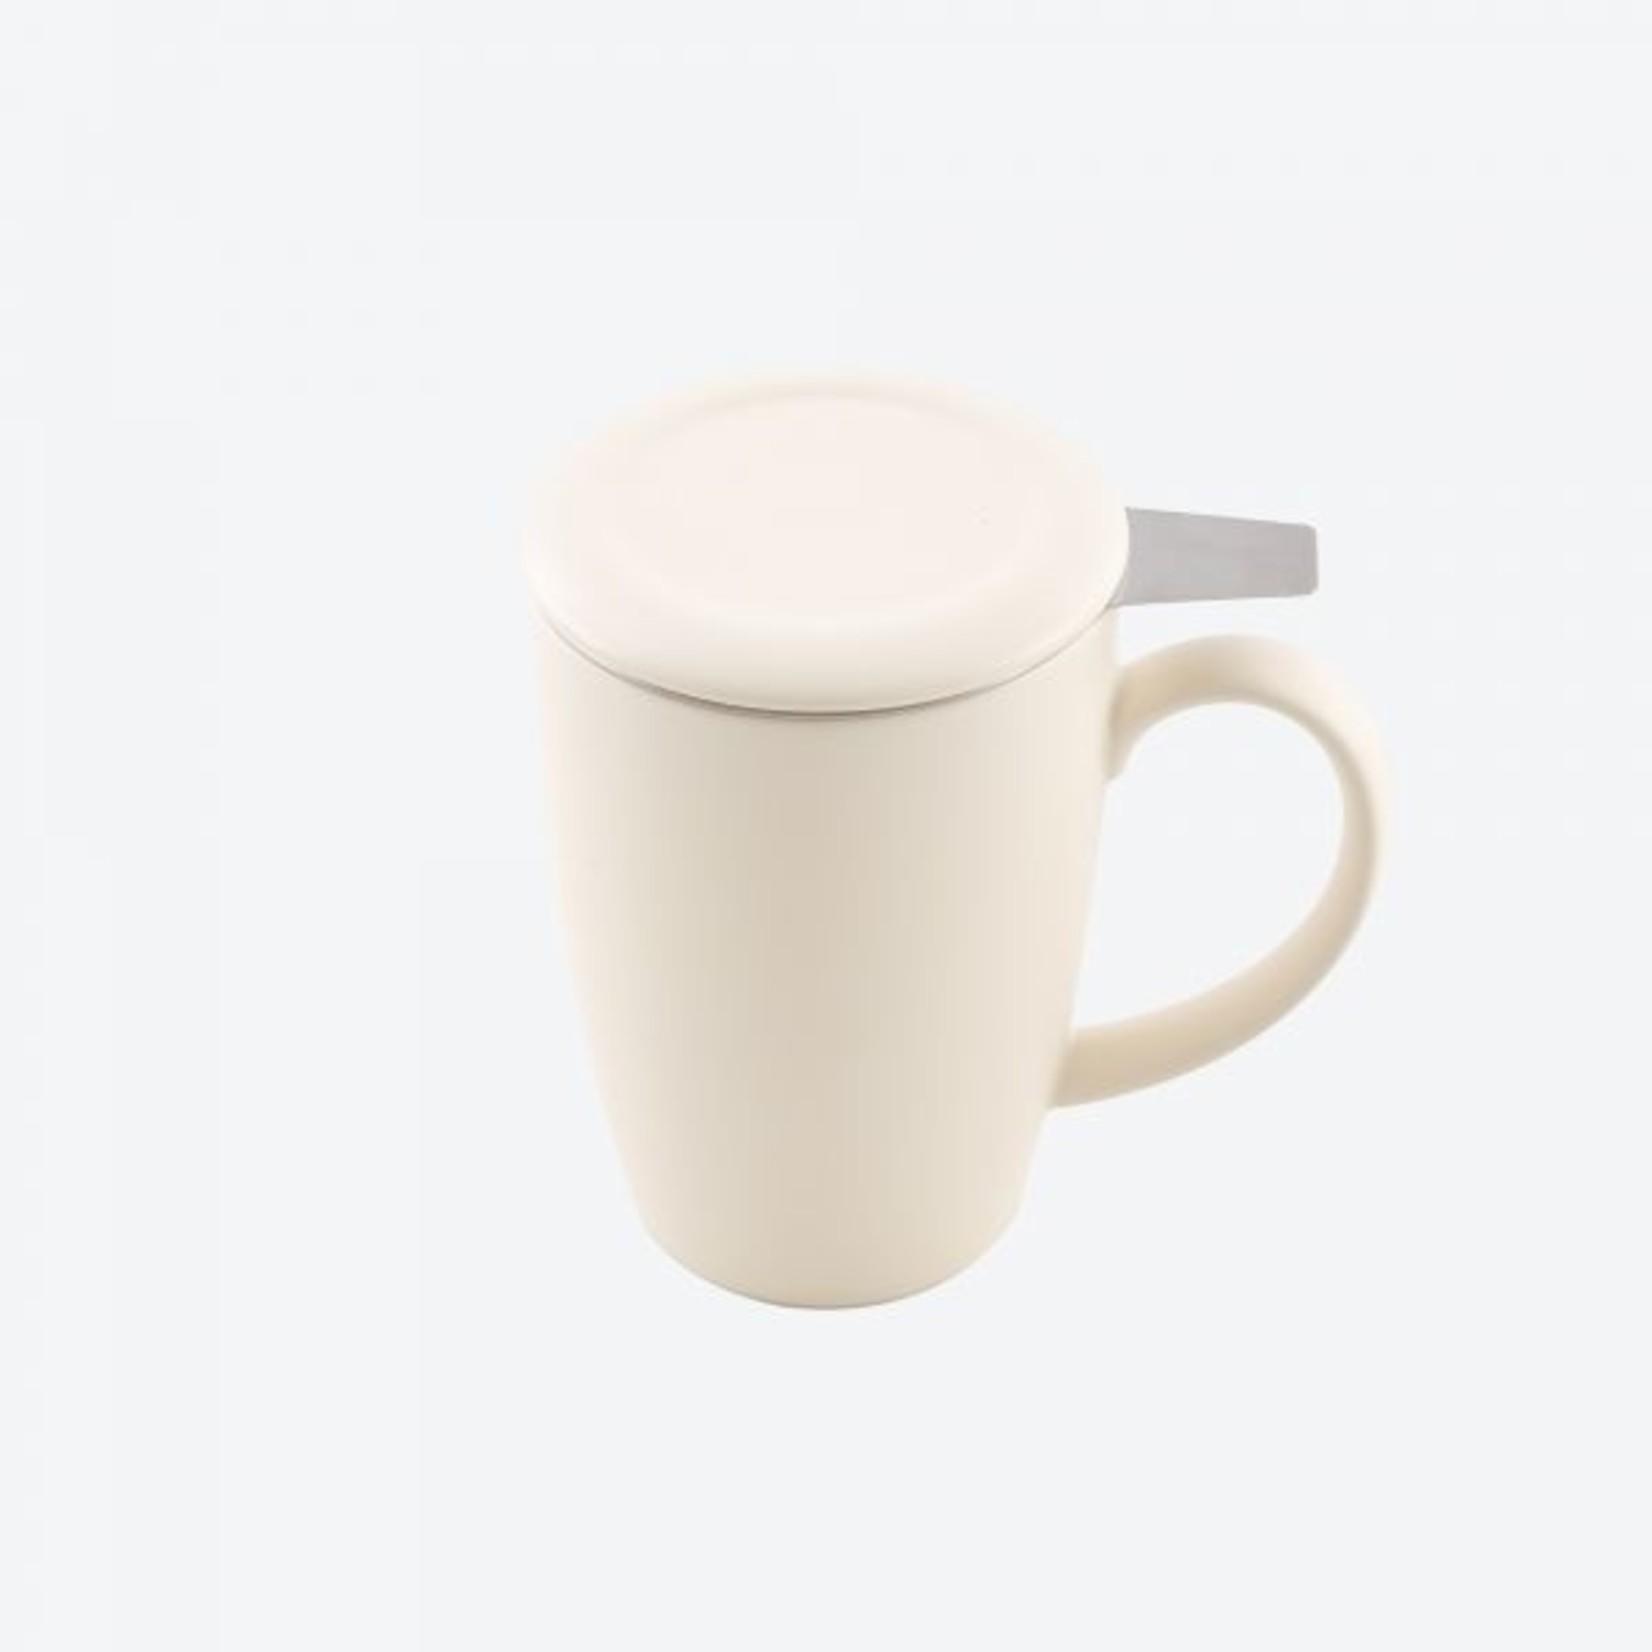 Point Virgule Mok met thee infuser en deksel - 3 kleuren